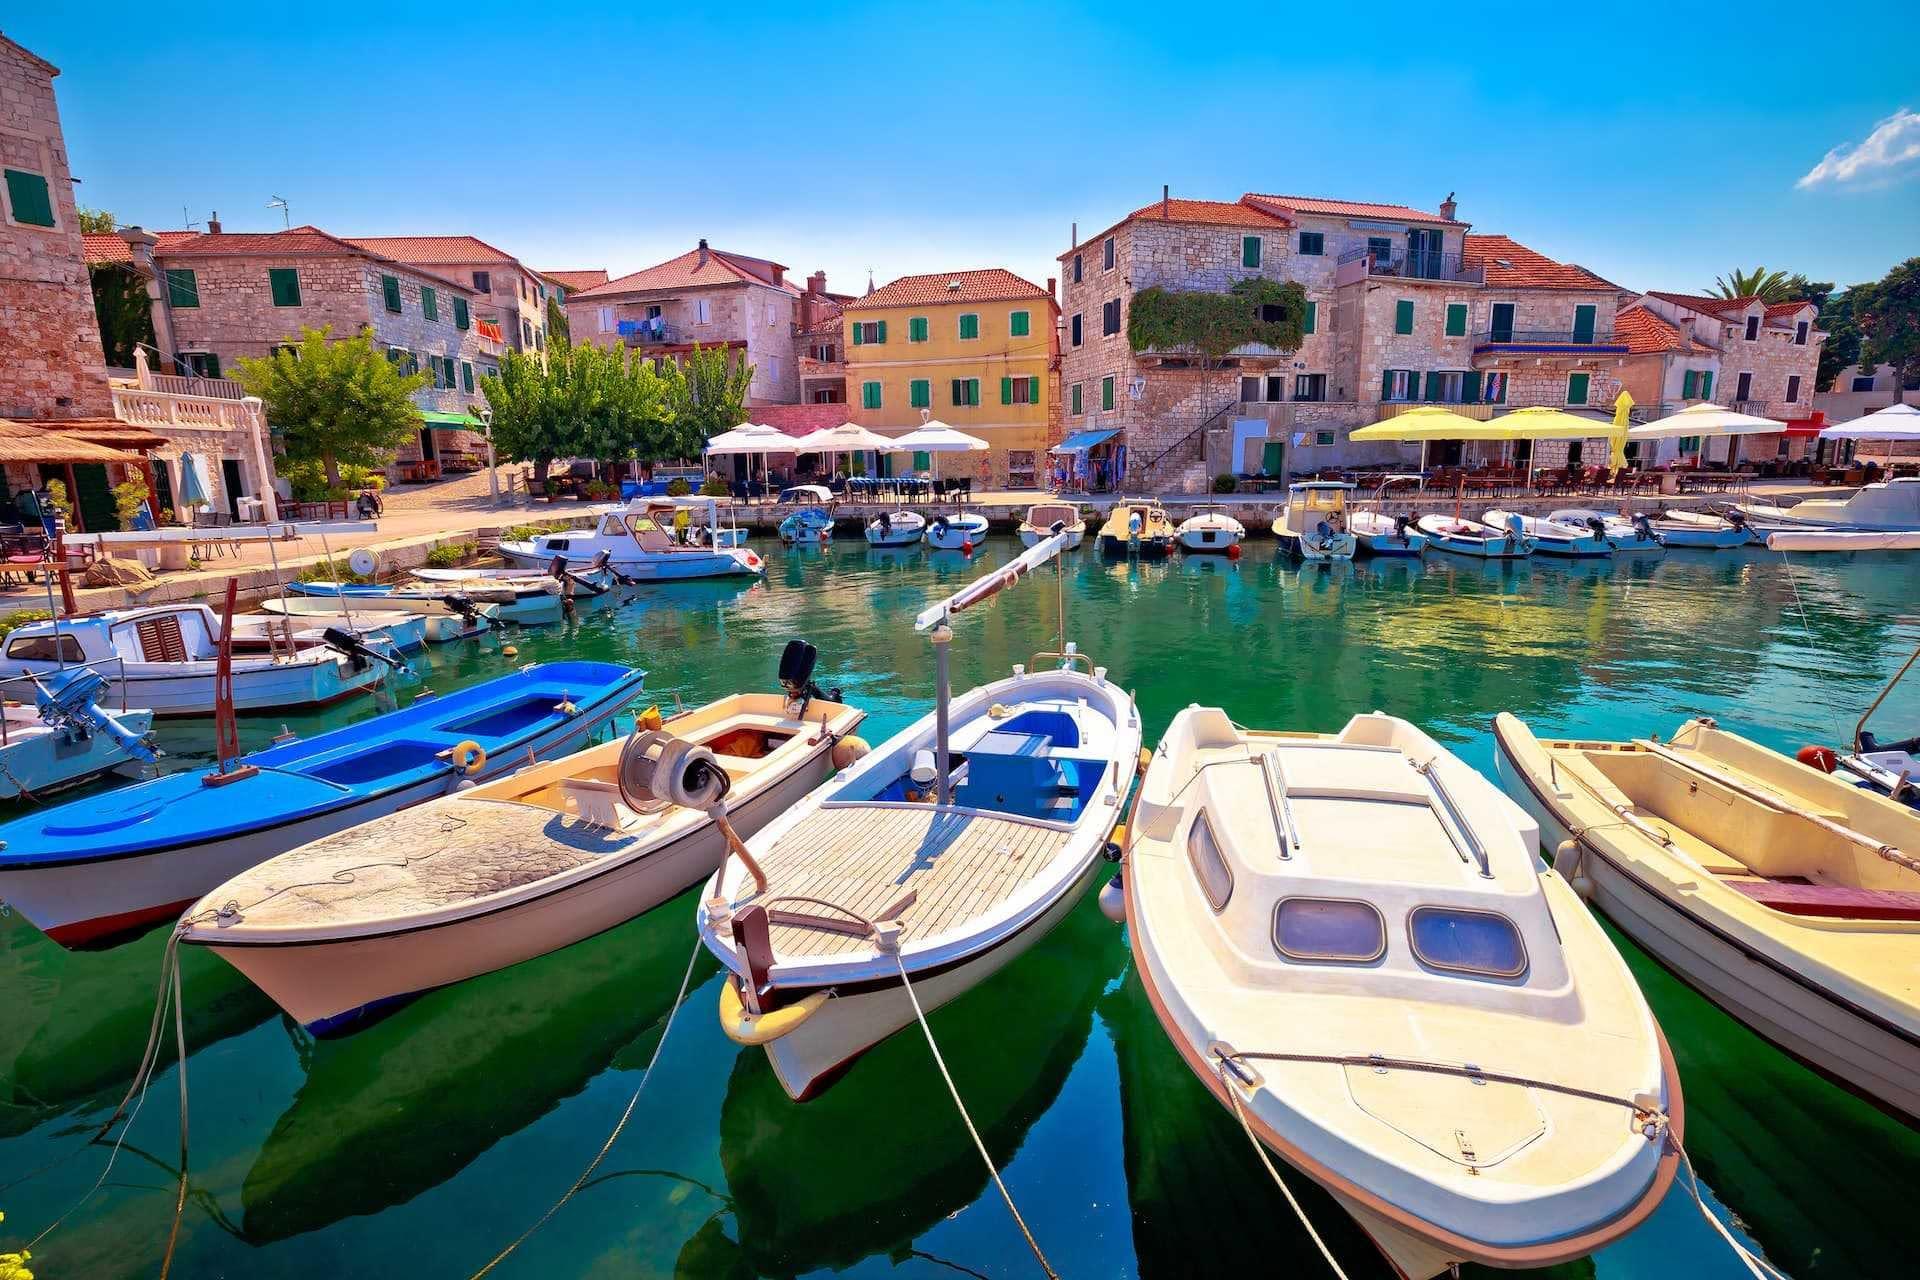 tasting-olive-oil-world-olive-oil-sommelier-program-heads-to-croatia-olive-oil-times